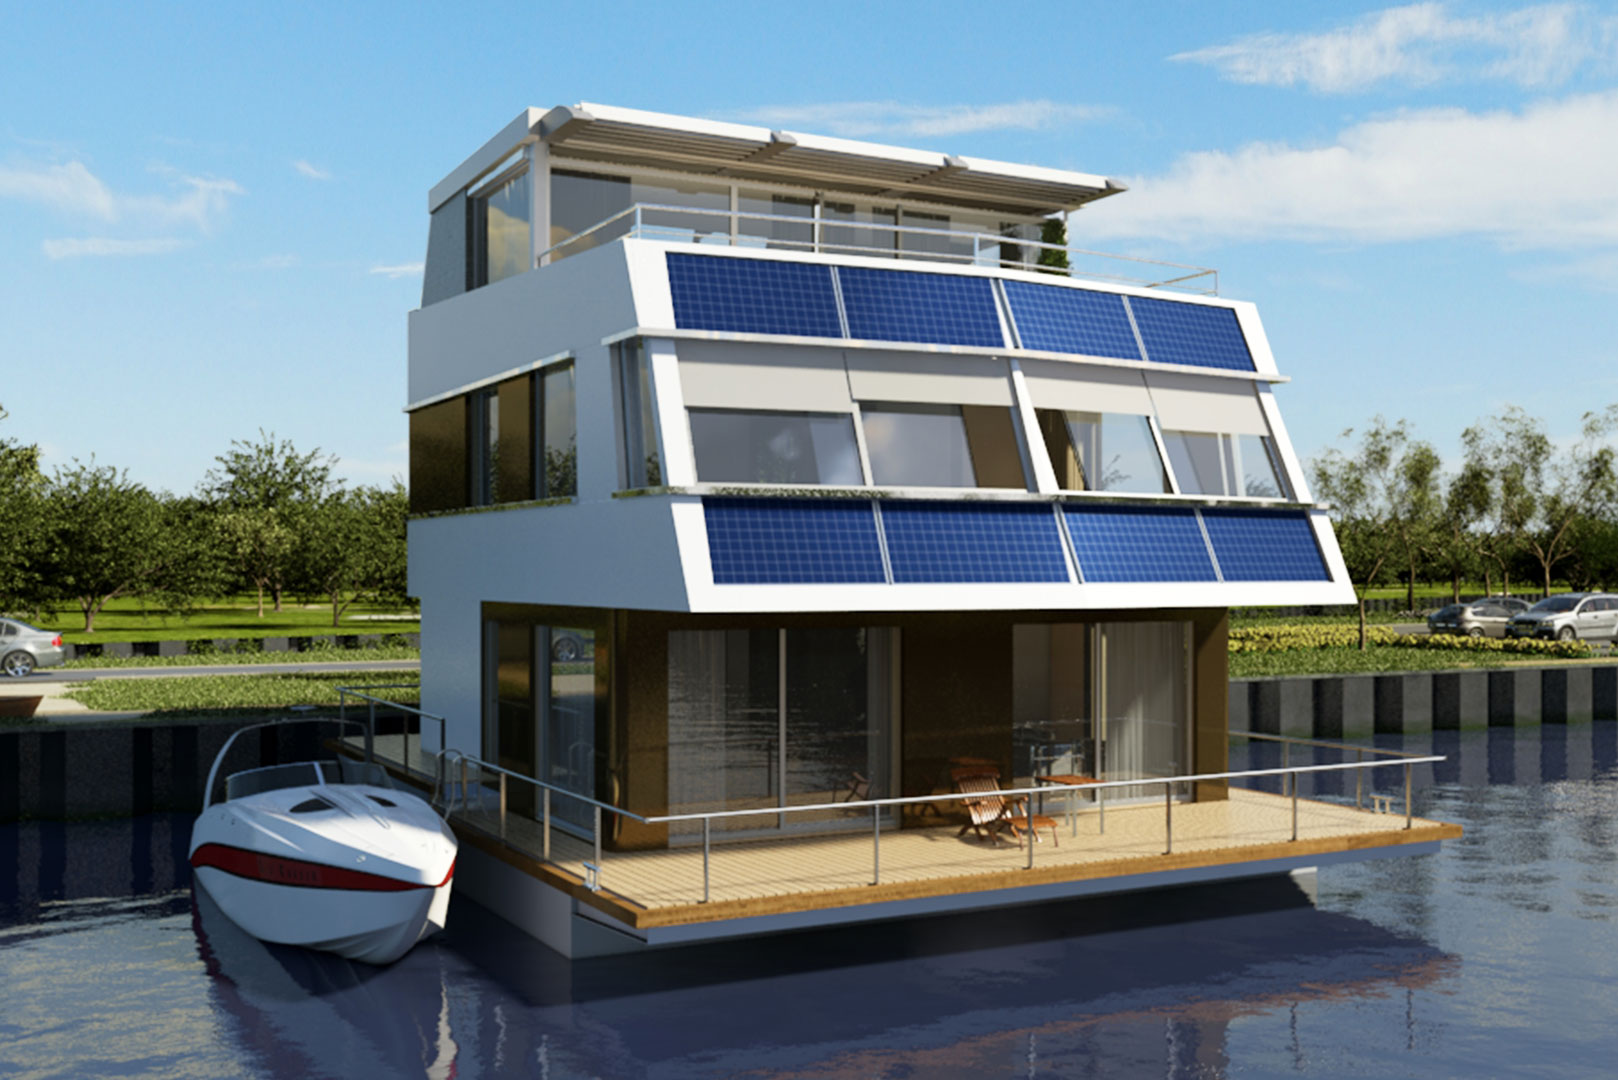 hausboote und schwimmende h user floating 160 kaufen berlin humboldtinsel. Black Bedroom Furniture Sets. Home Design Ideas